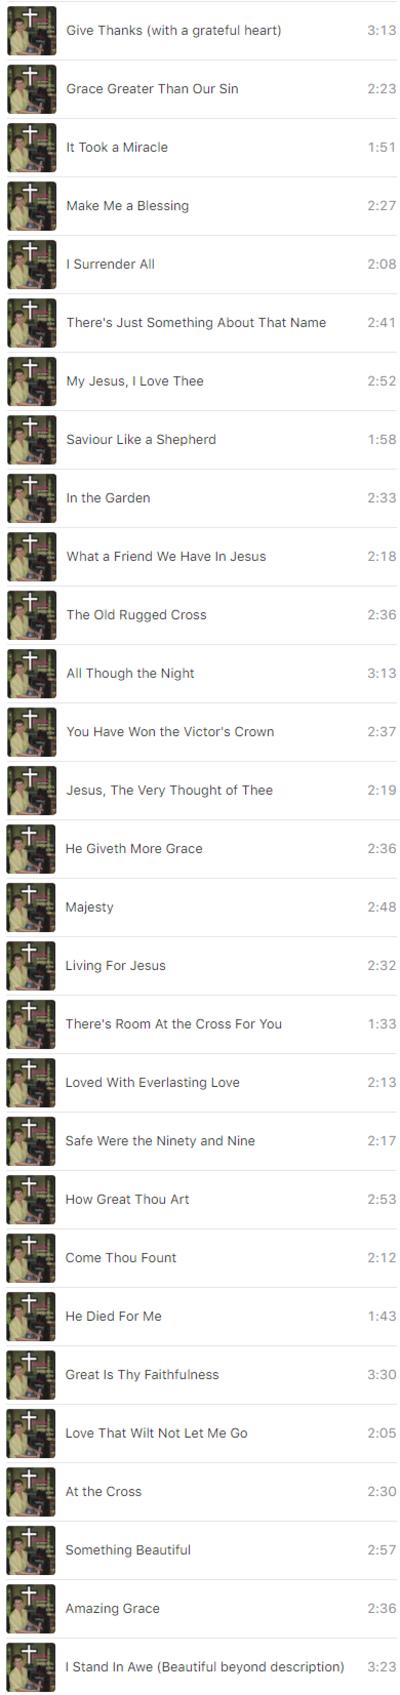 List of Hymns and Choruses